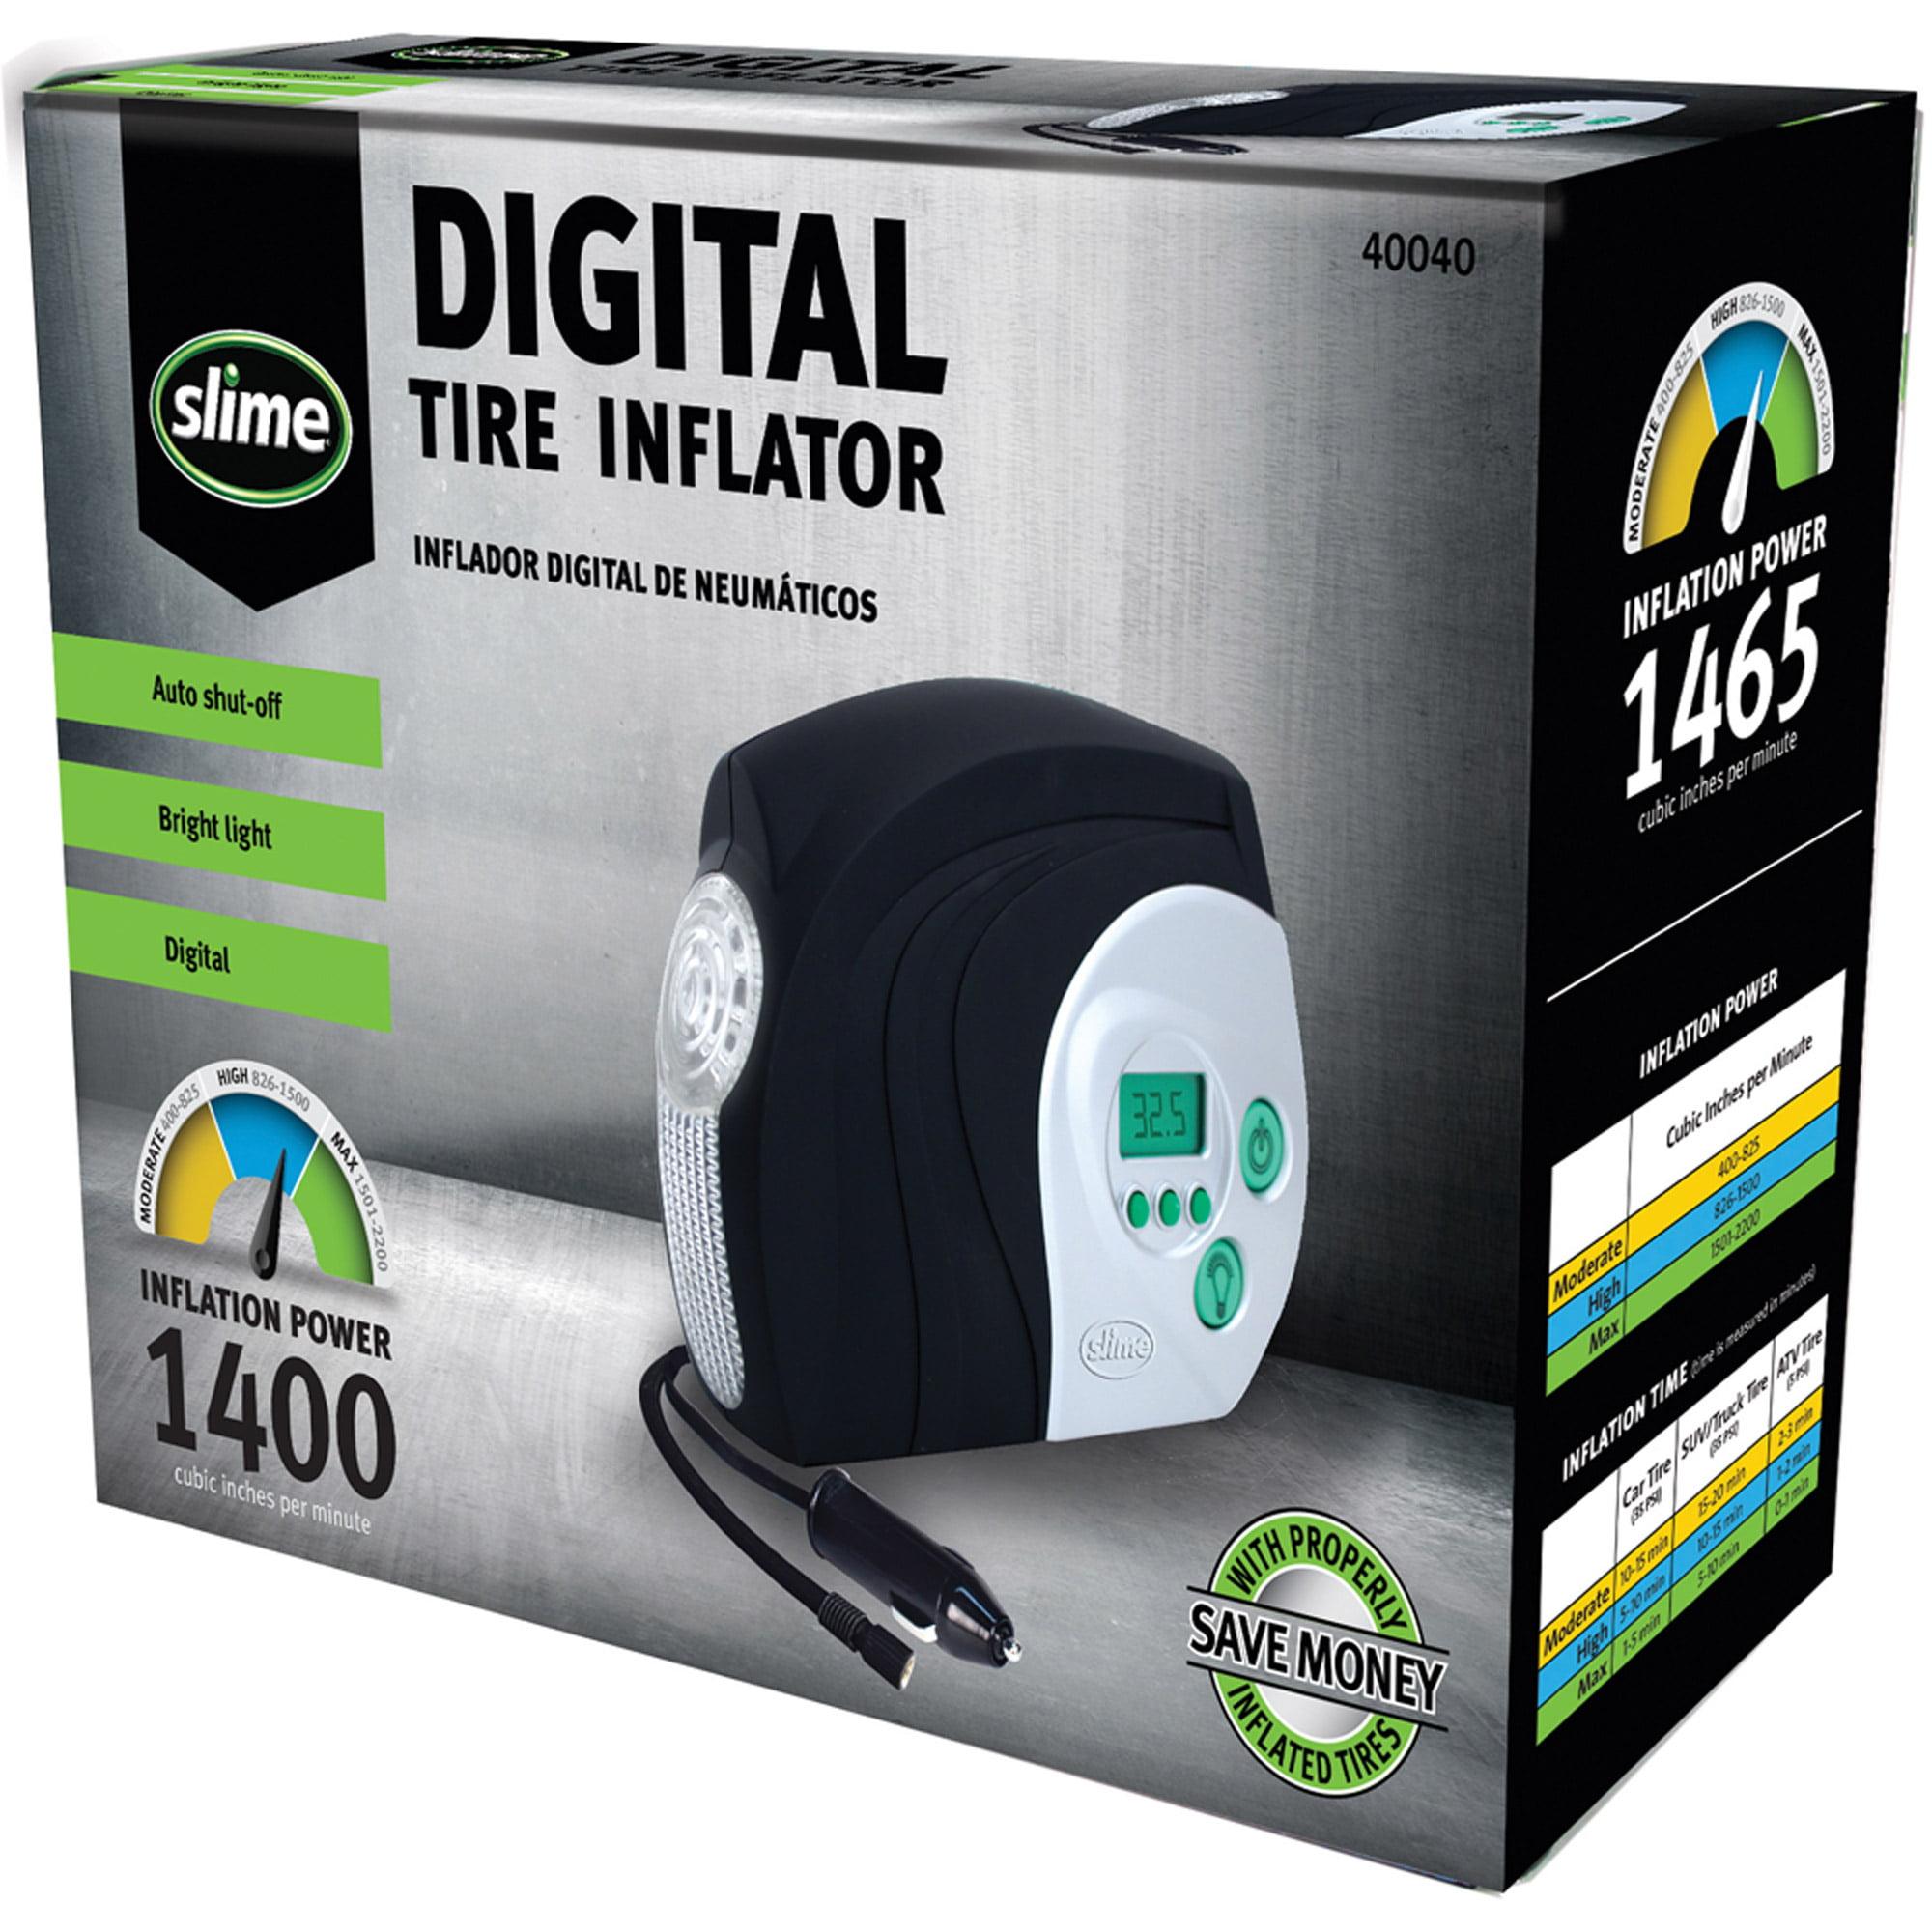 Slime Digital Tire Inflator